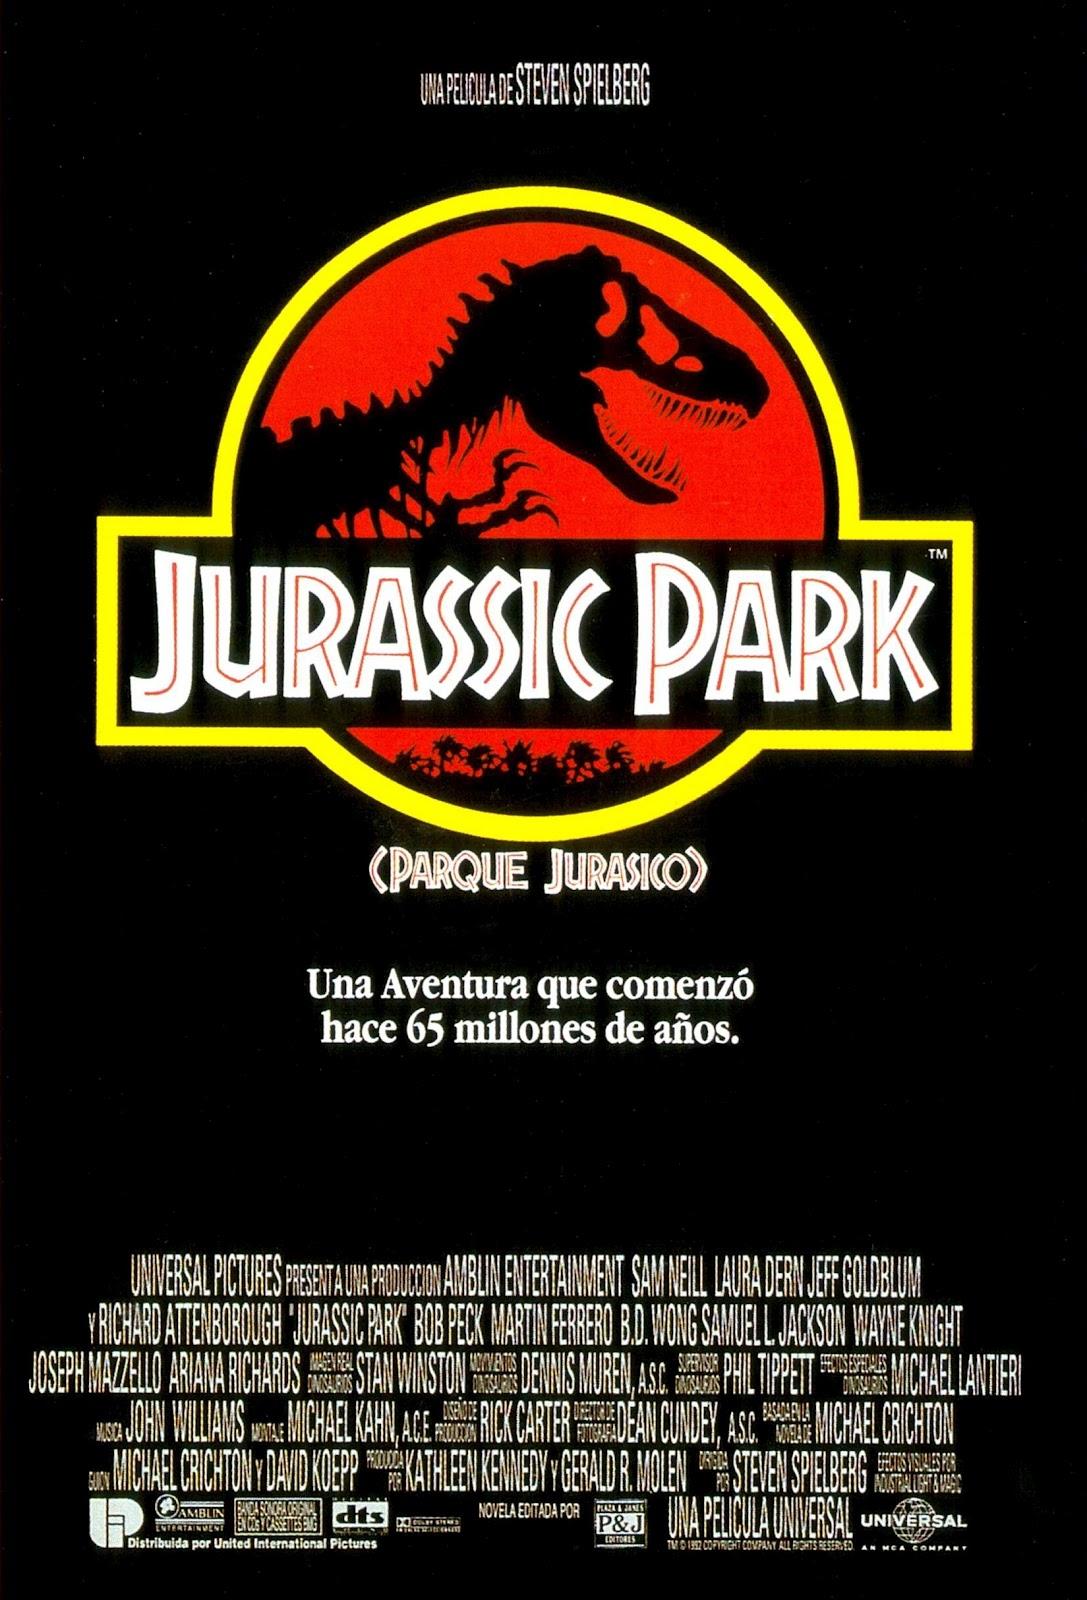 http://1.bp.blogspot.com/-hlX3ffzJwZo/UBf3cc-WrAI/AAAAAAAADDE/hA3TMhh2fsQ/s1600/Jurassic_park_-_Parque_jurasico.jpg